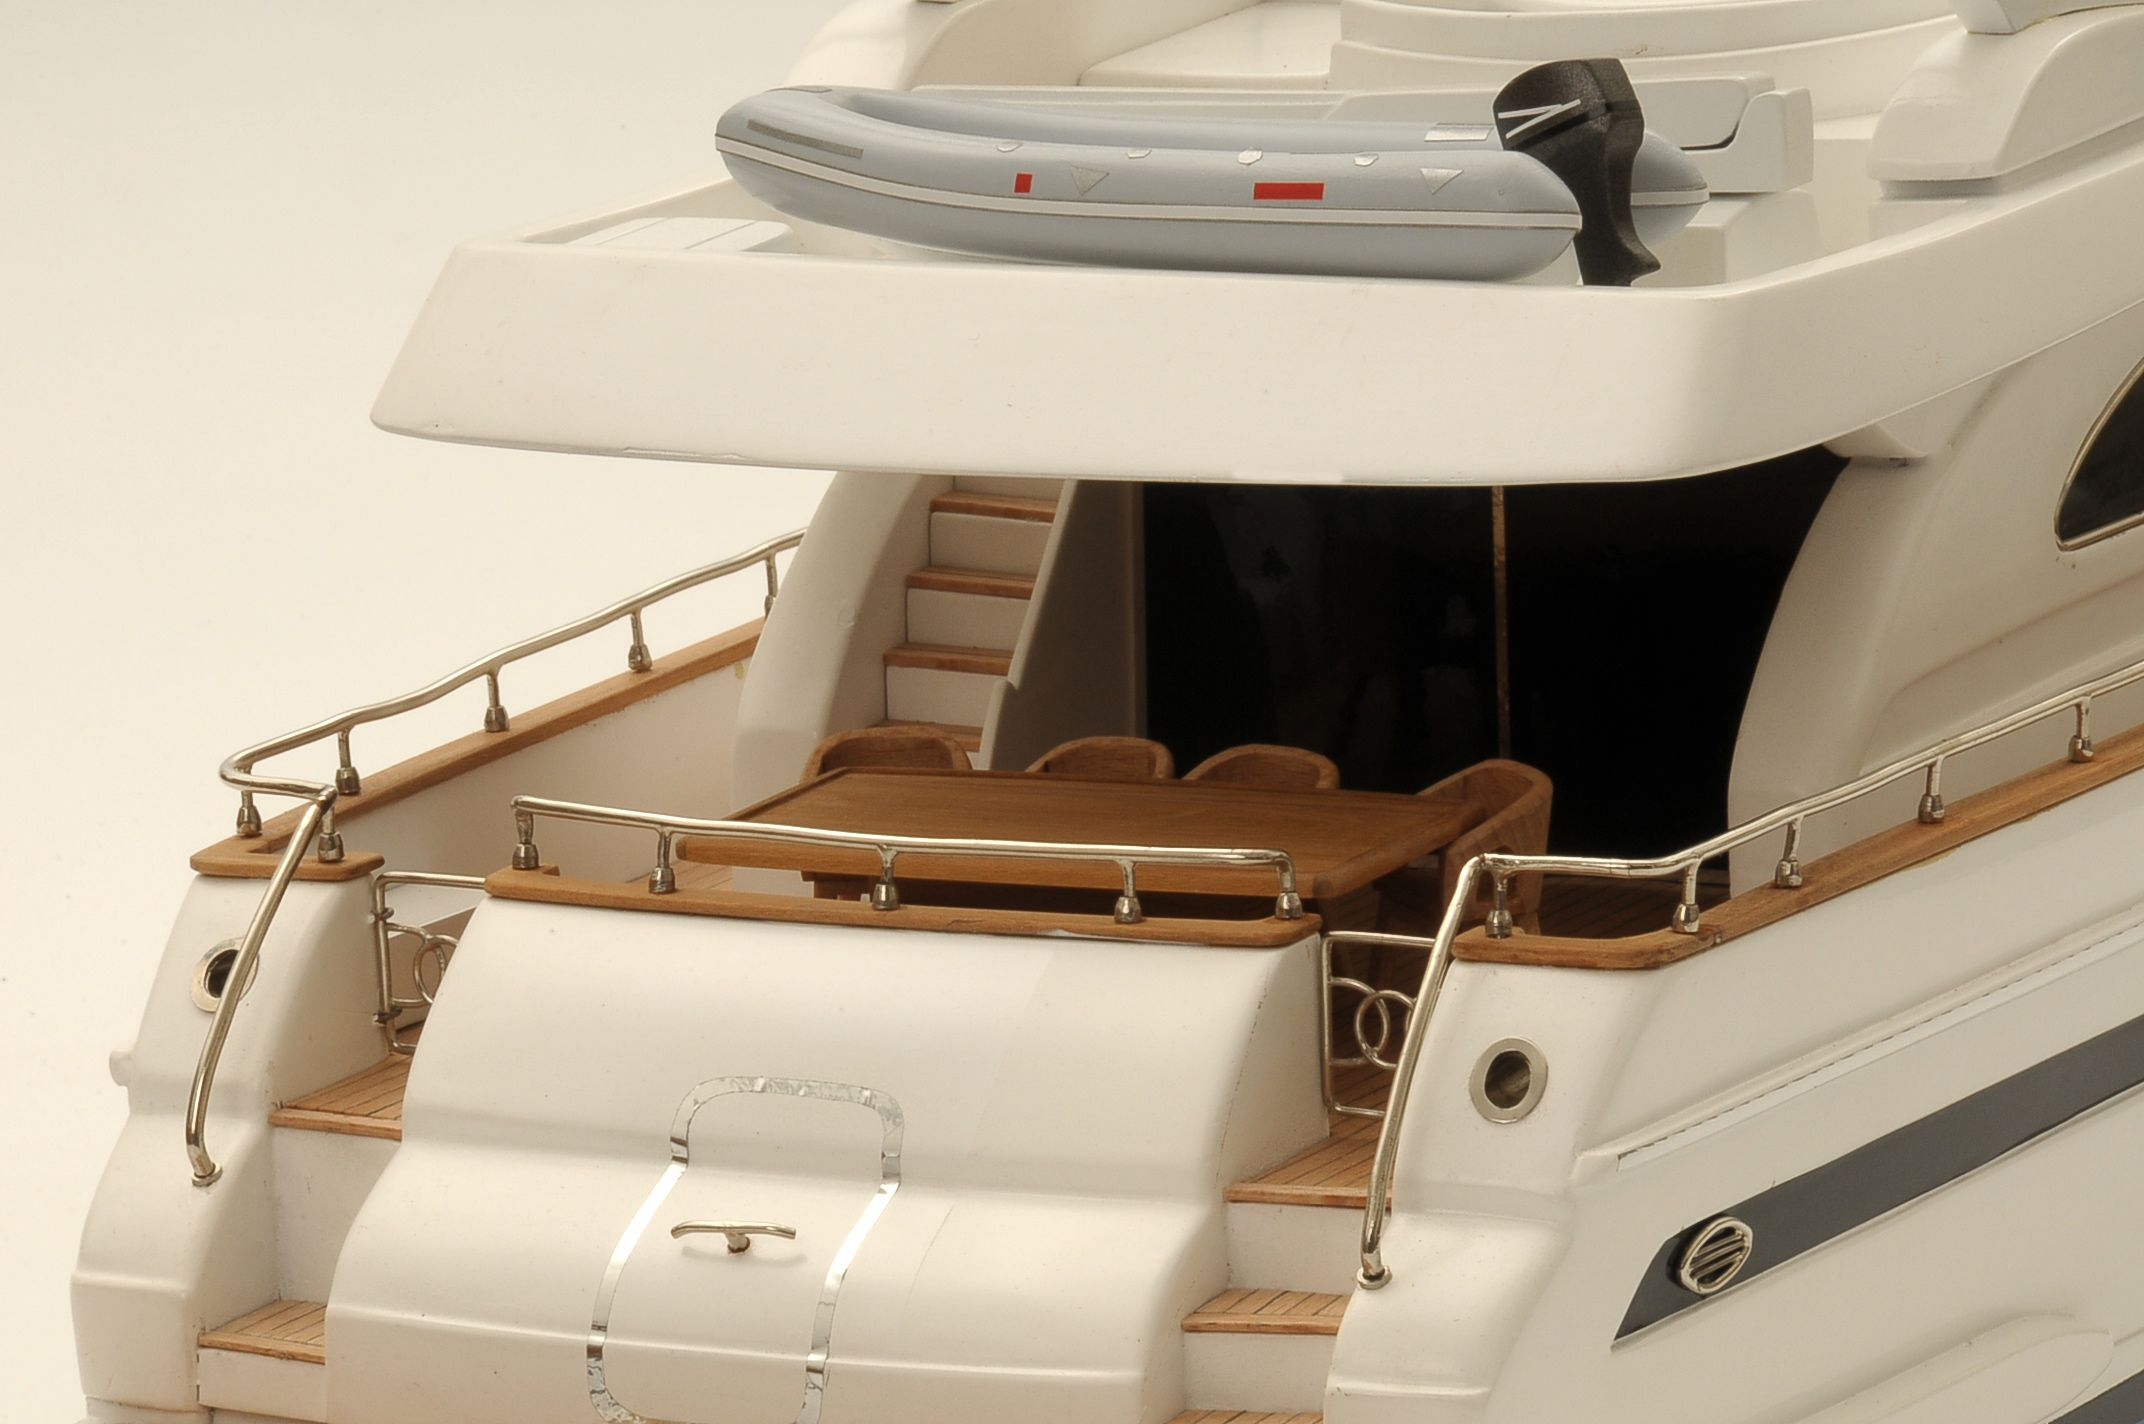 1236-6353-Astondoa-72-GLX-Motor-Yacht-Premier-Range